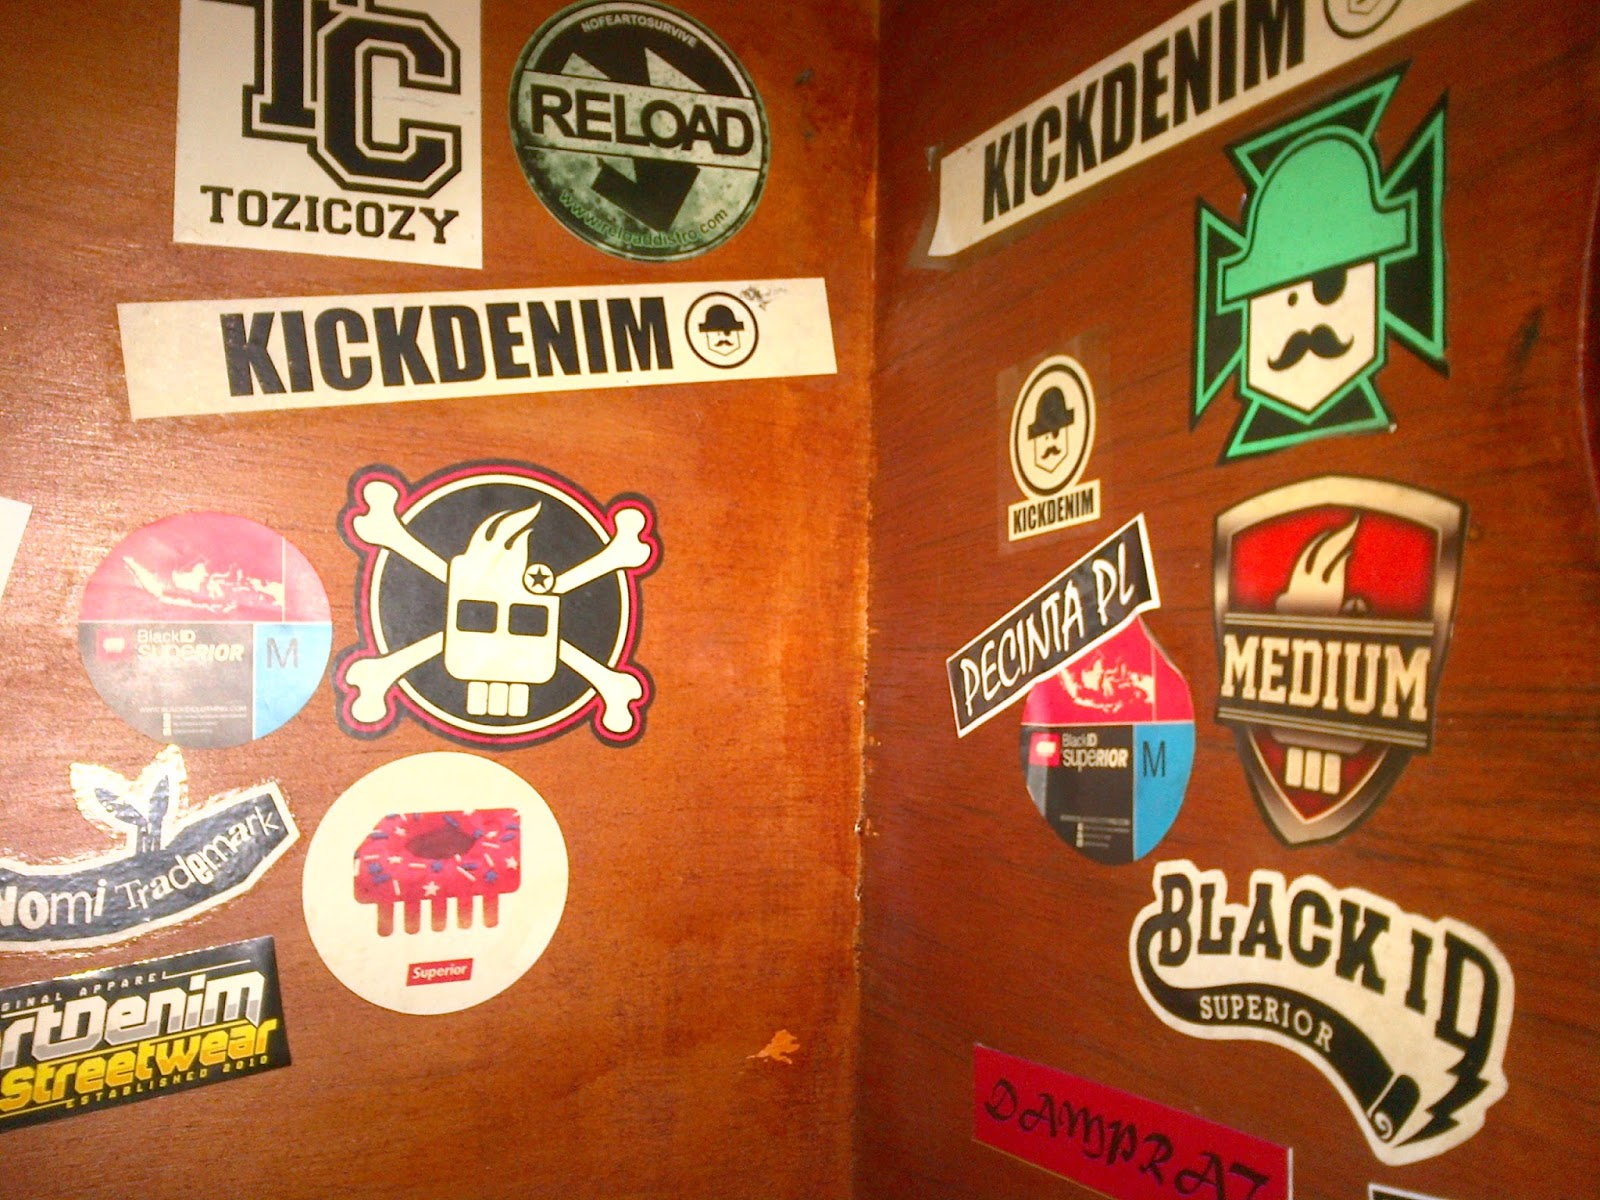 Cetak Stiker Murah Jakarta Buka 24 Jam Rawamangun Timur